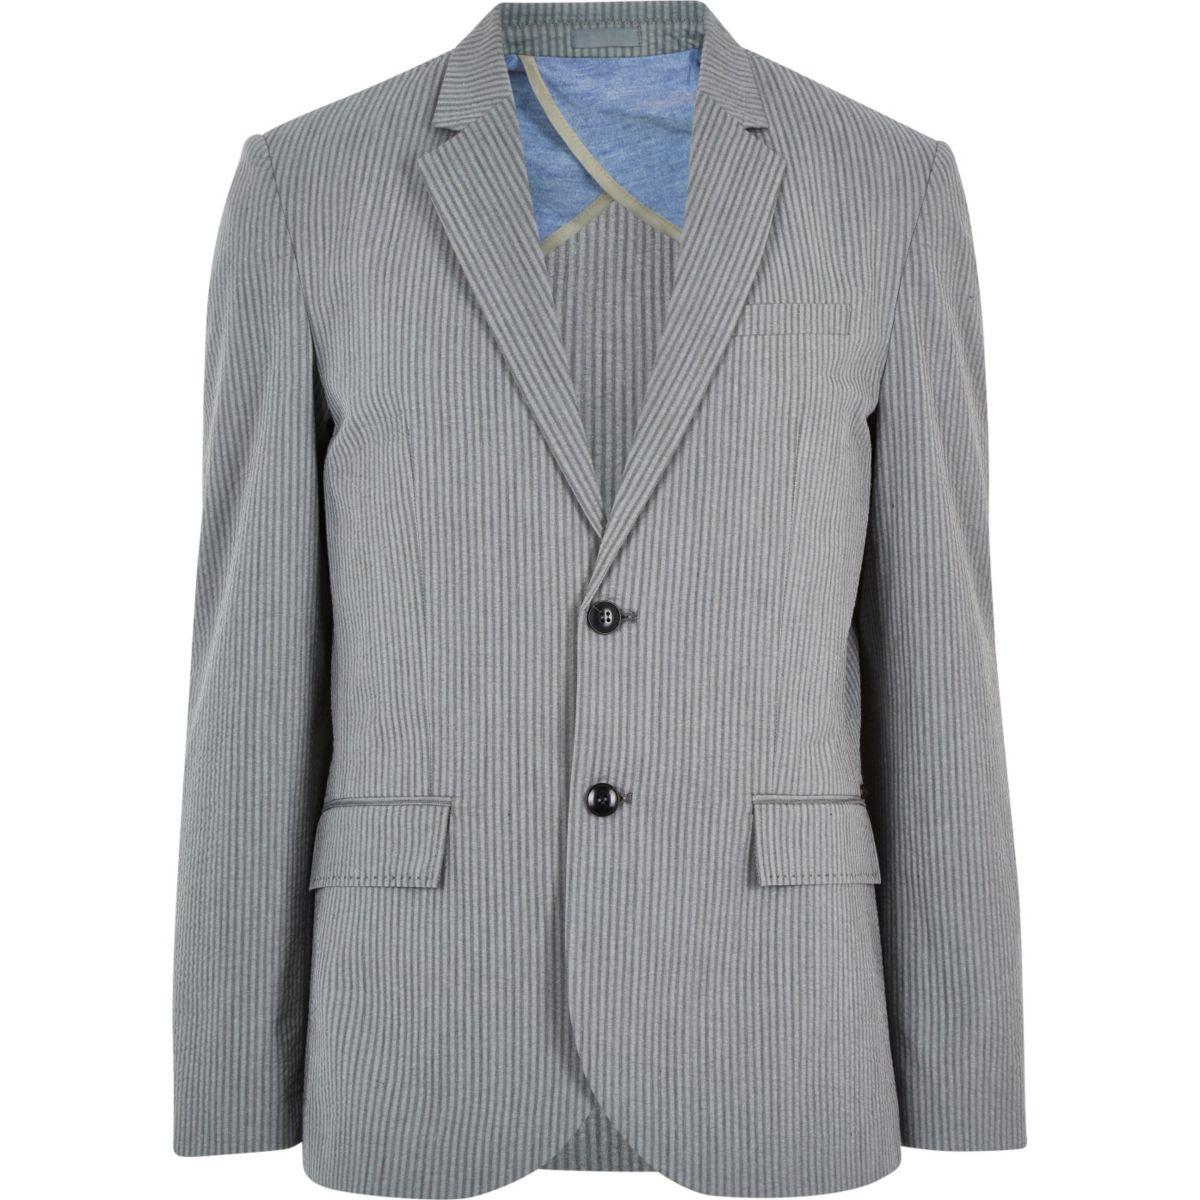 grey cotton seersucker blazer - blazers - sale - men